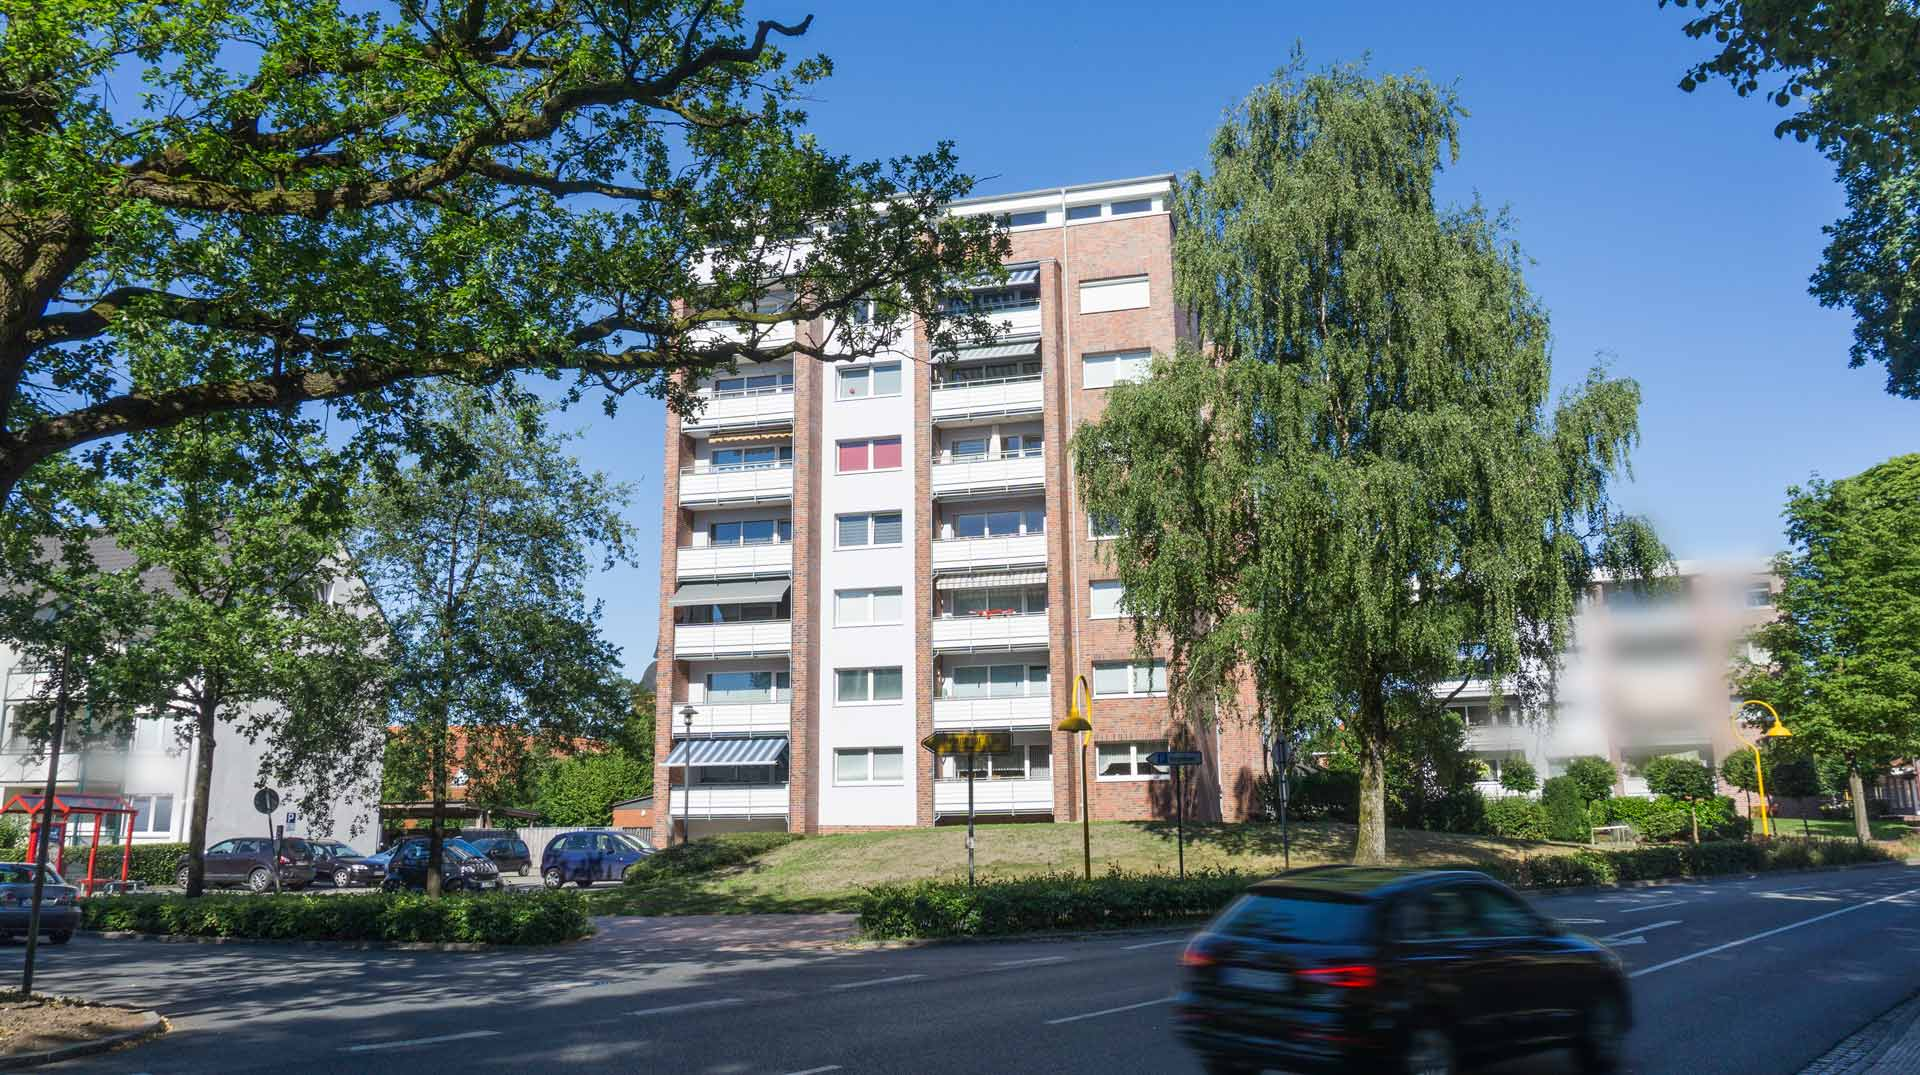 Baustatik Ingenieurbüro Kaltenkirchen Henstedt-Ulzburg - Baustatik Groth